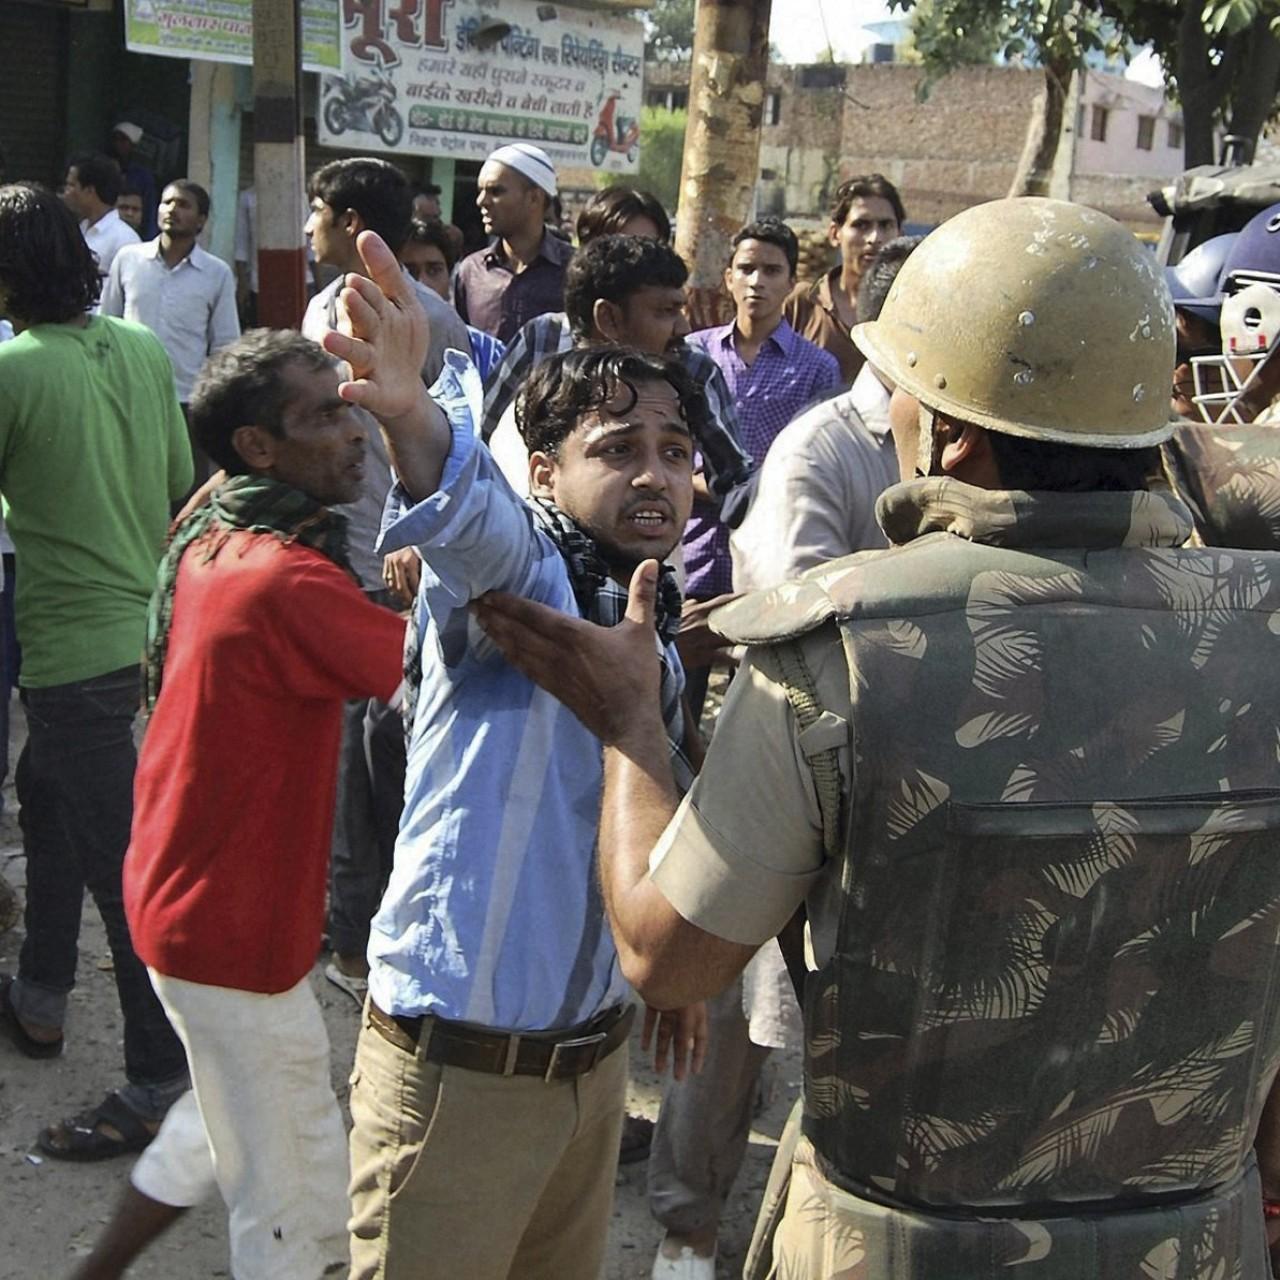 Muslim-Hindu violence in Uttar Pradesh helped India's Modi take